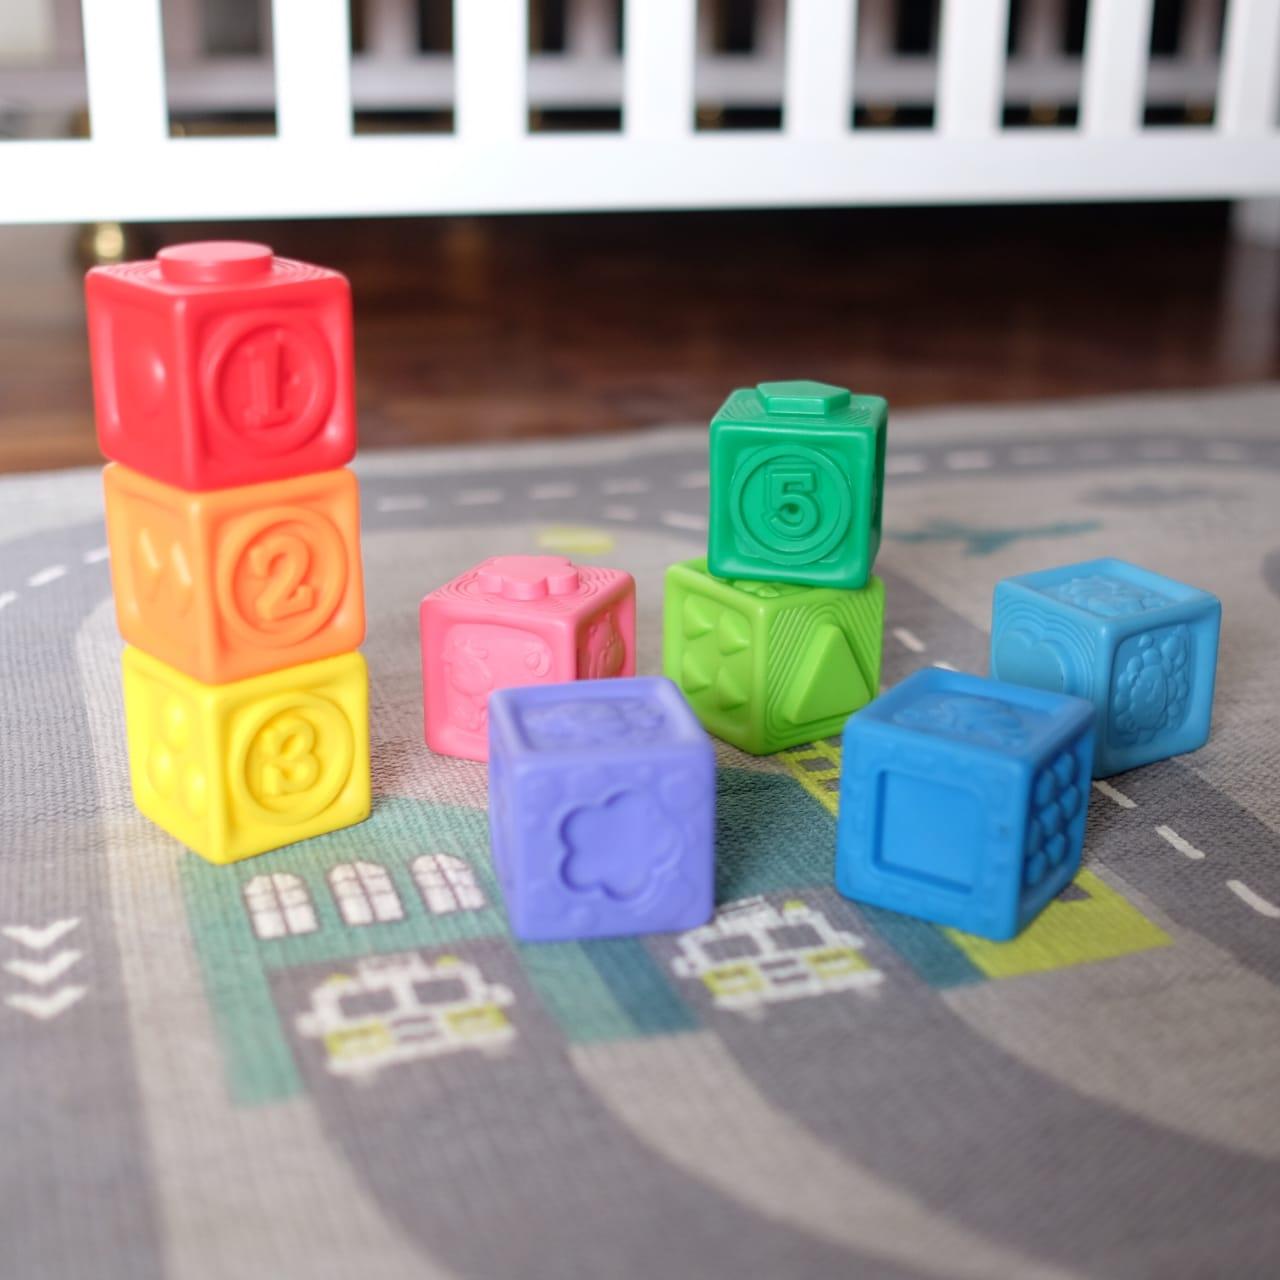 stacking rubber blocks